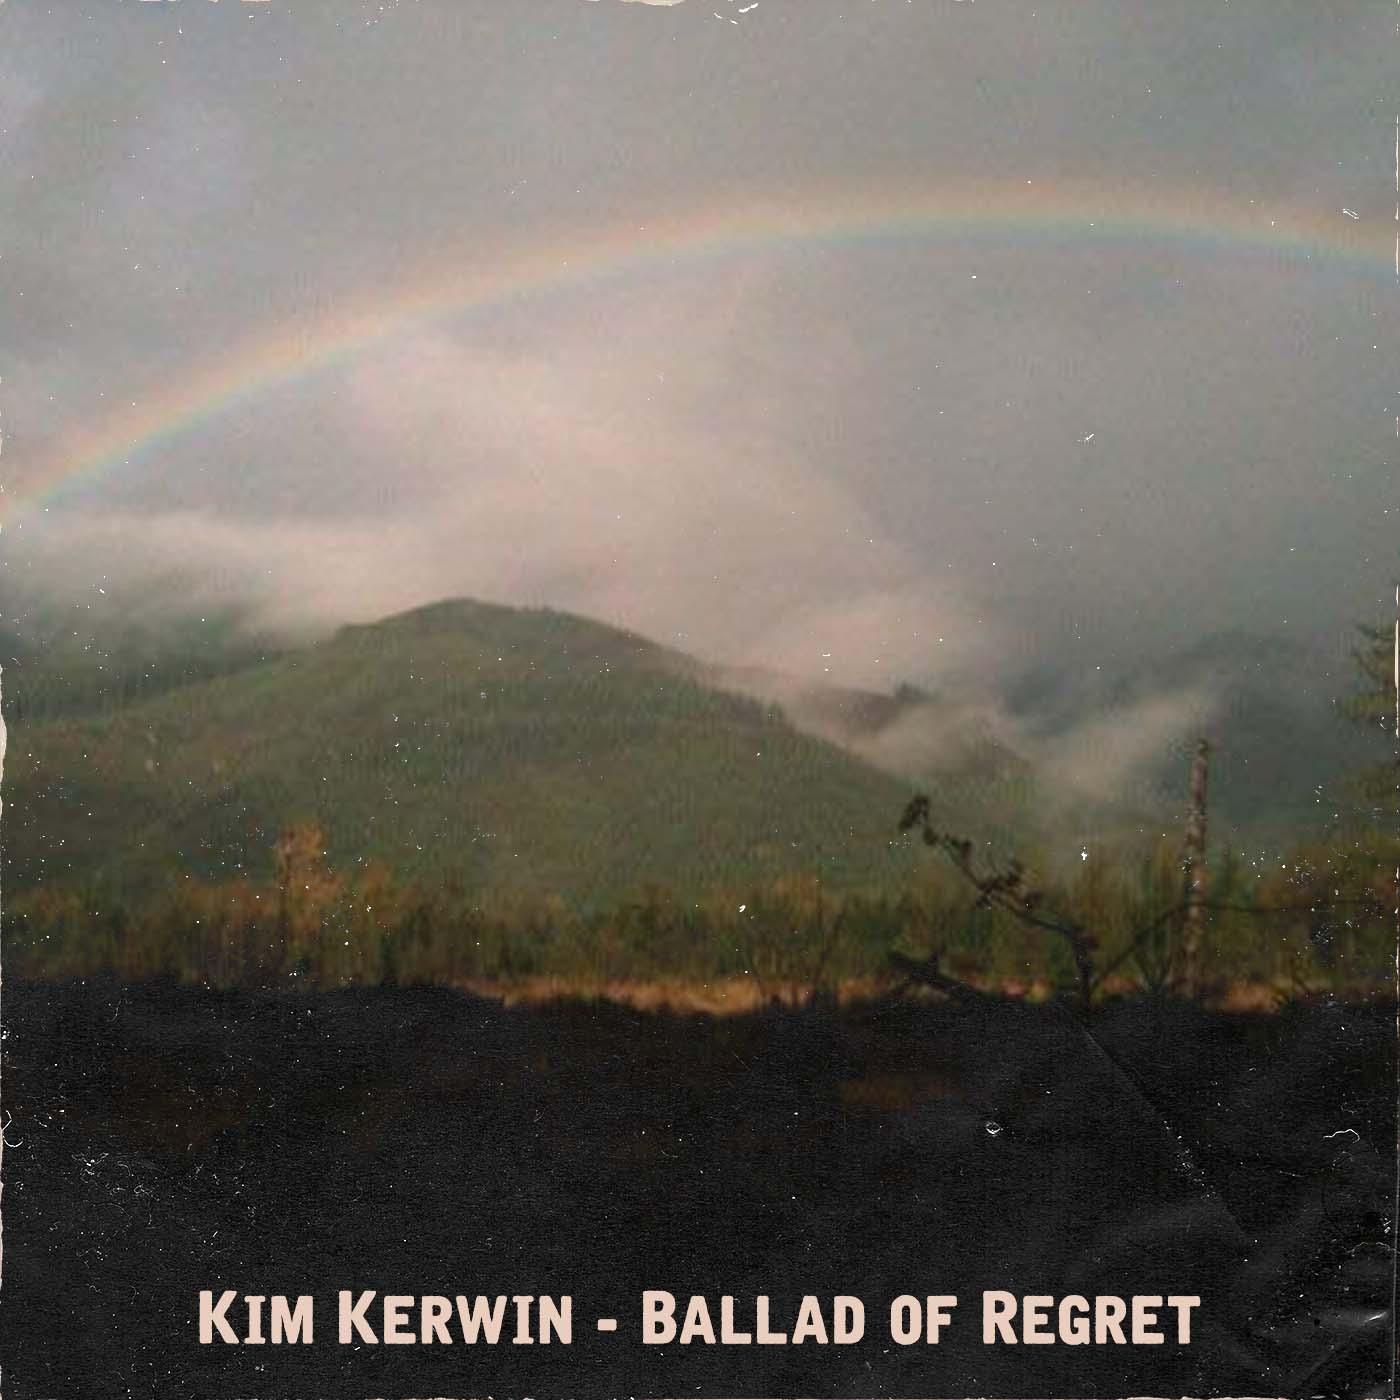 Ballad-of-Regret-Kim-Kerwin